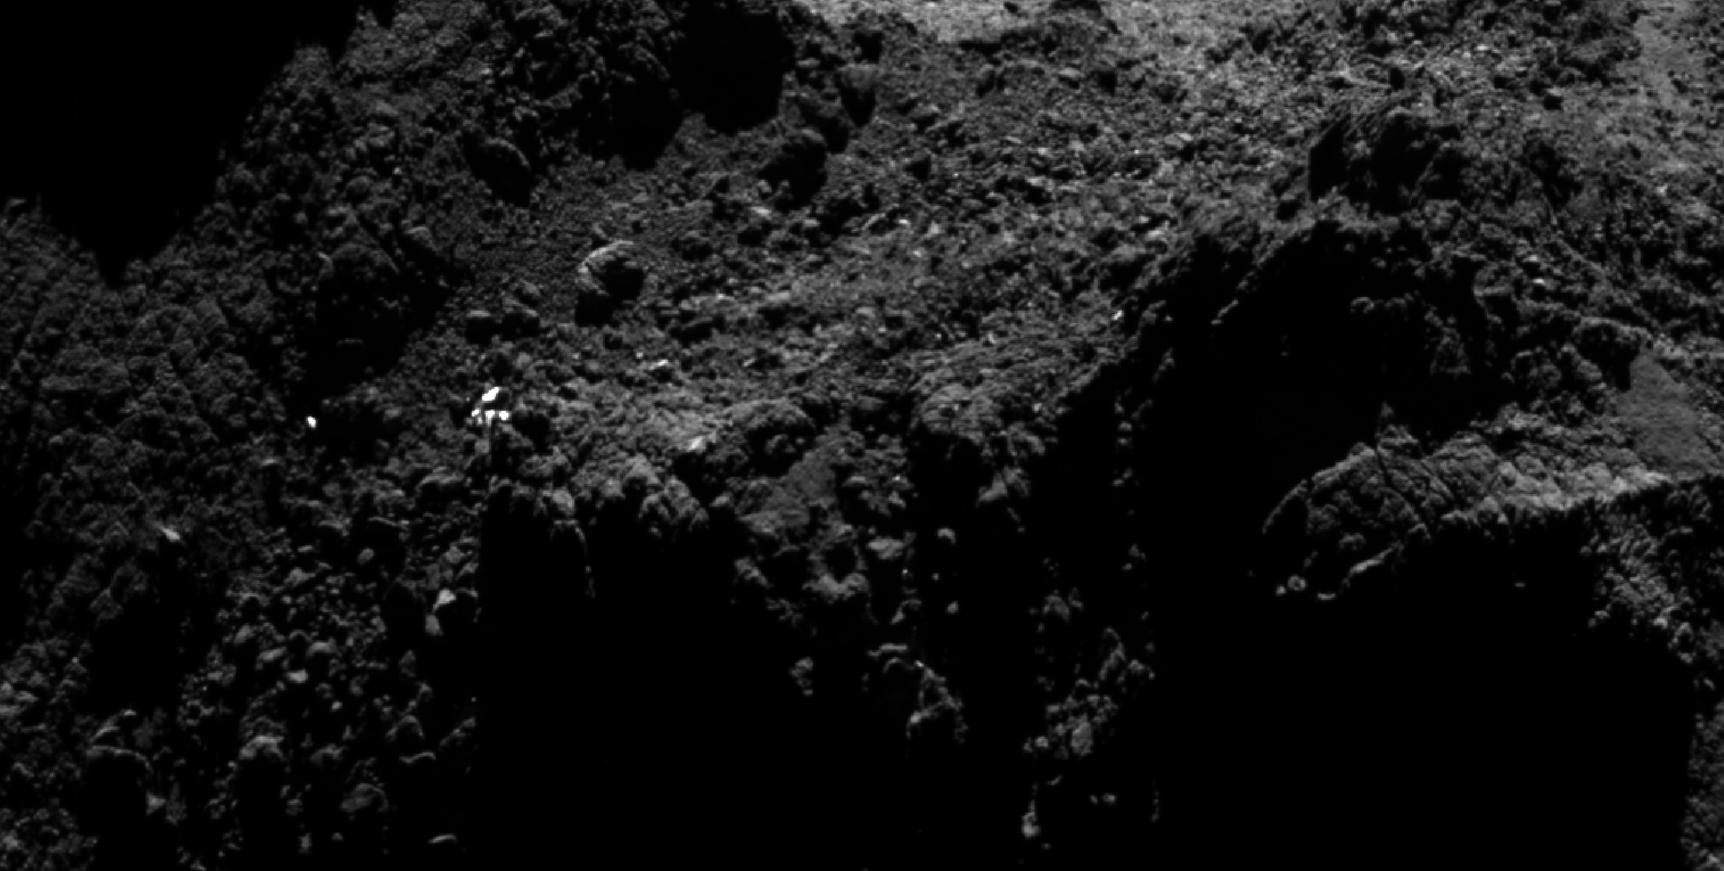 Have We Found Rosetta's Lost Philae Lander? - Universe Today